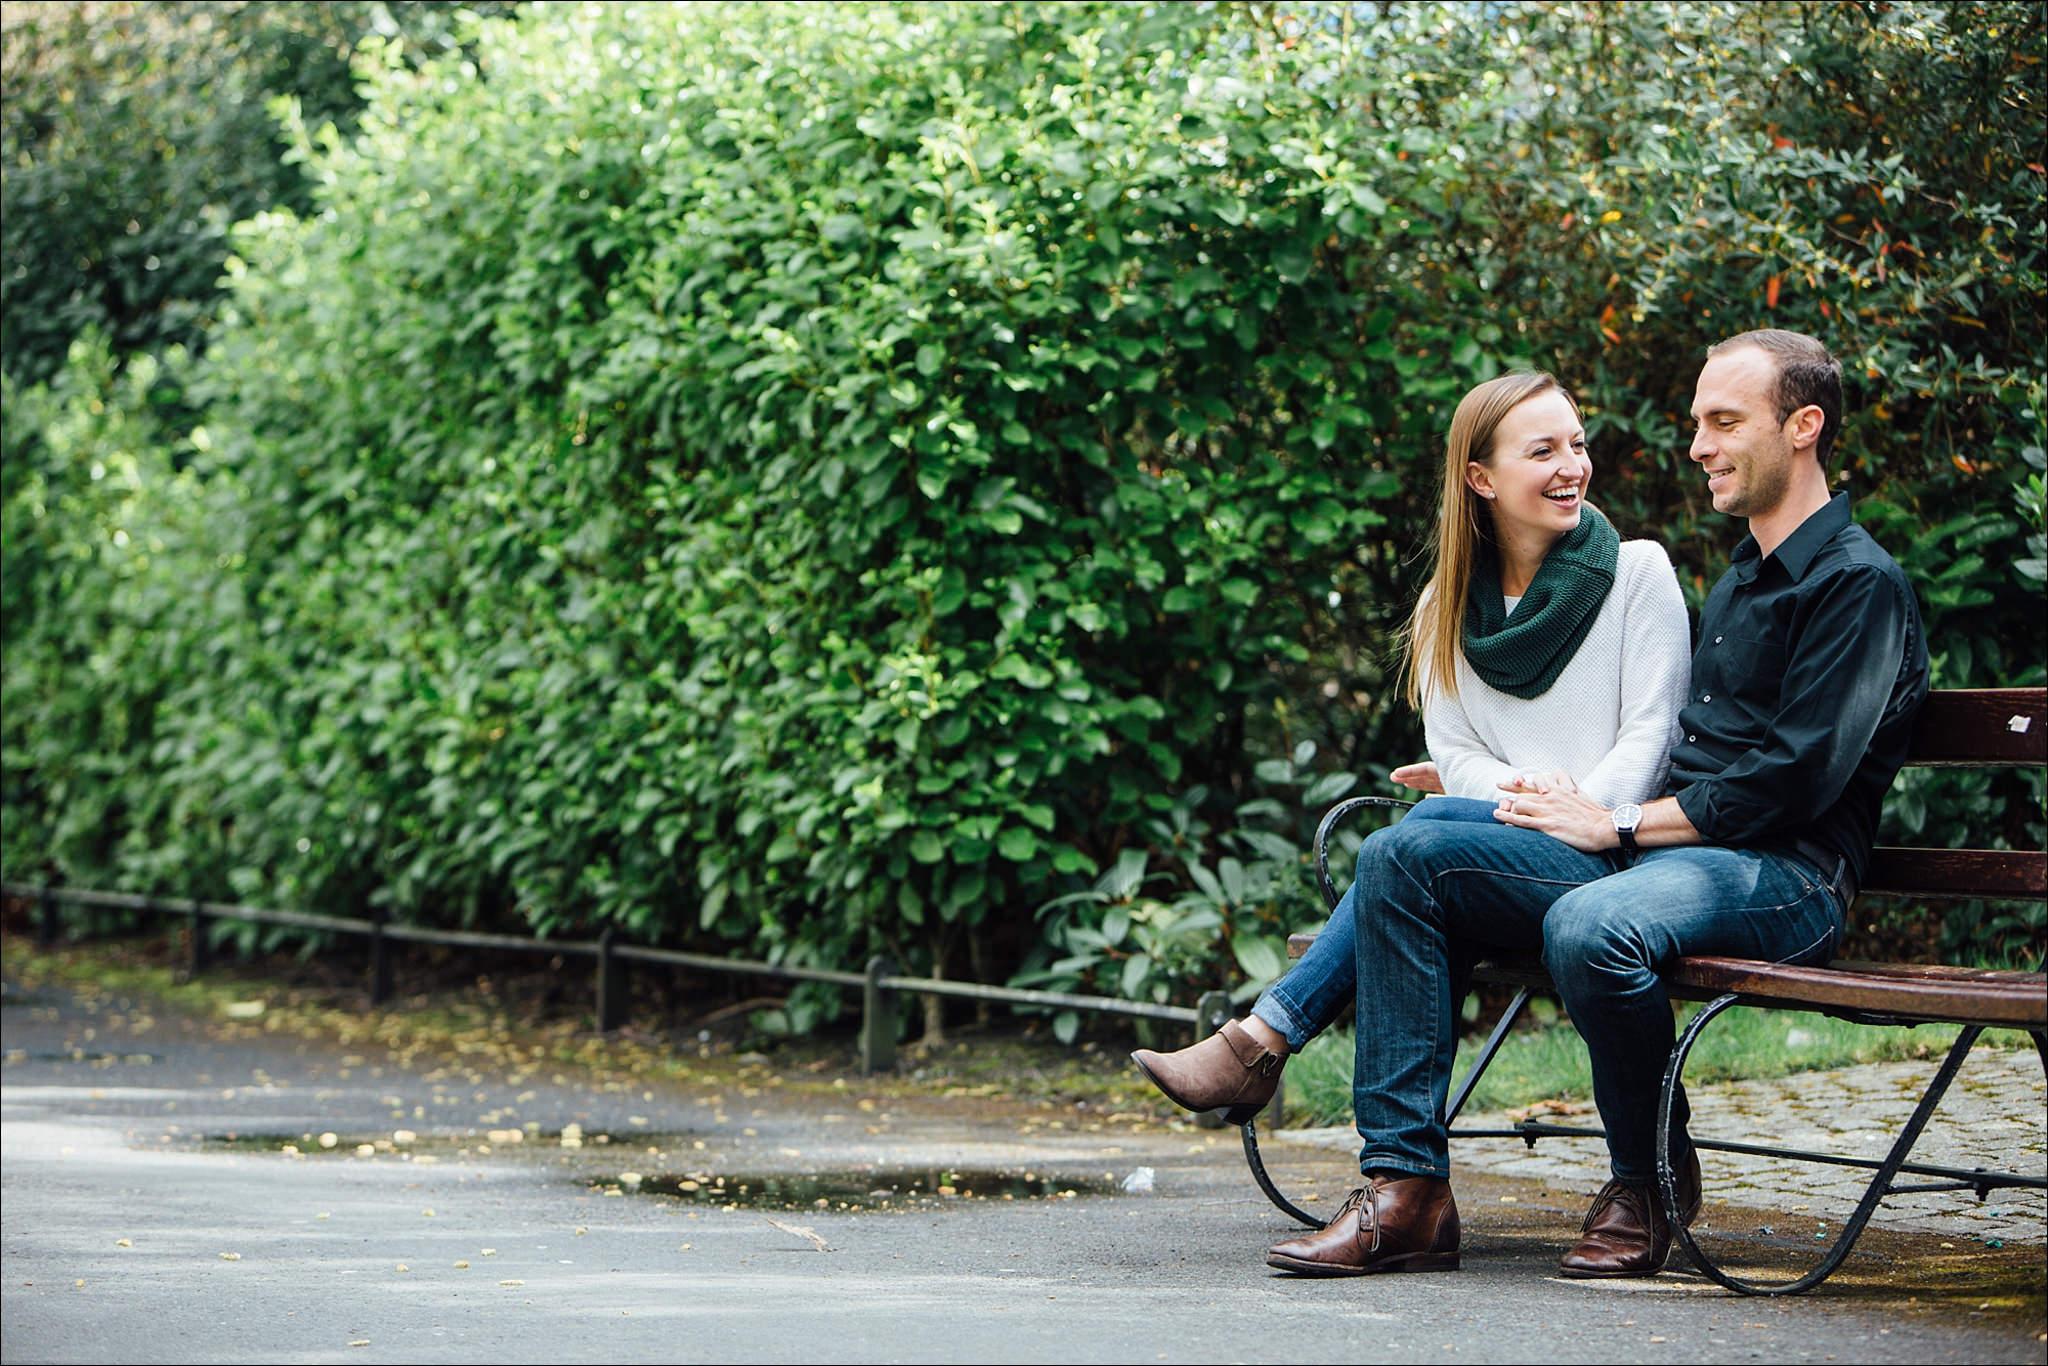 dublin wedding photographer david duignan photography engagement couple city photo shoot  ireland 0004